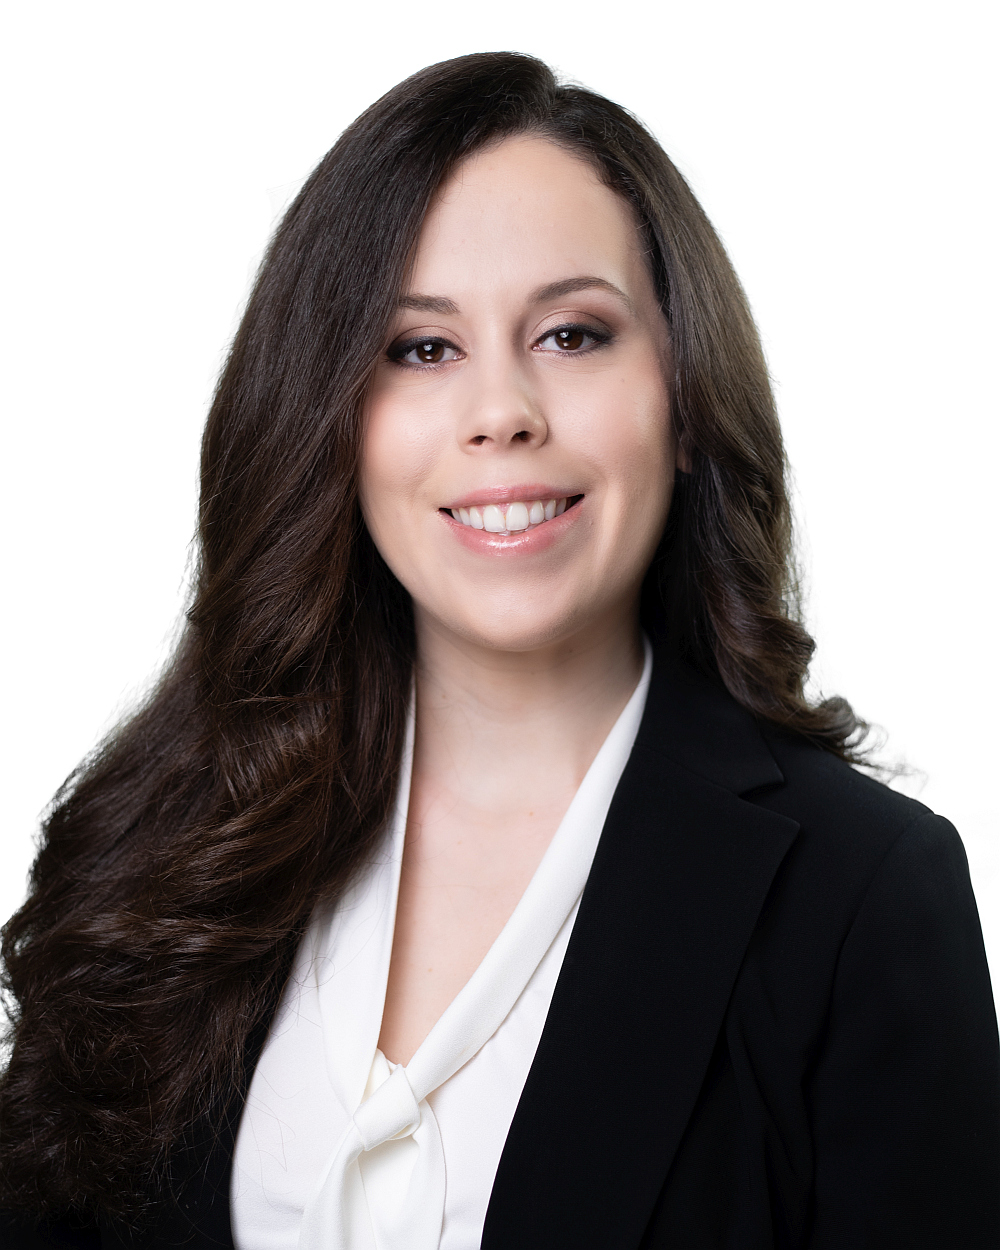 Young brunette woman business headshot